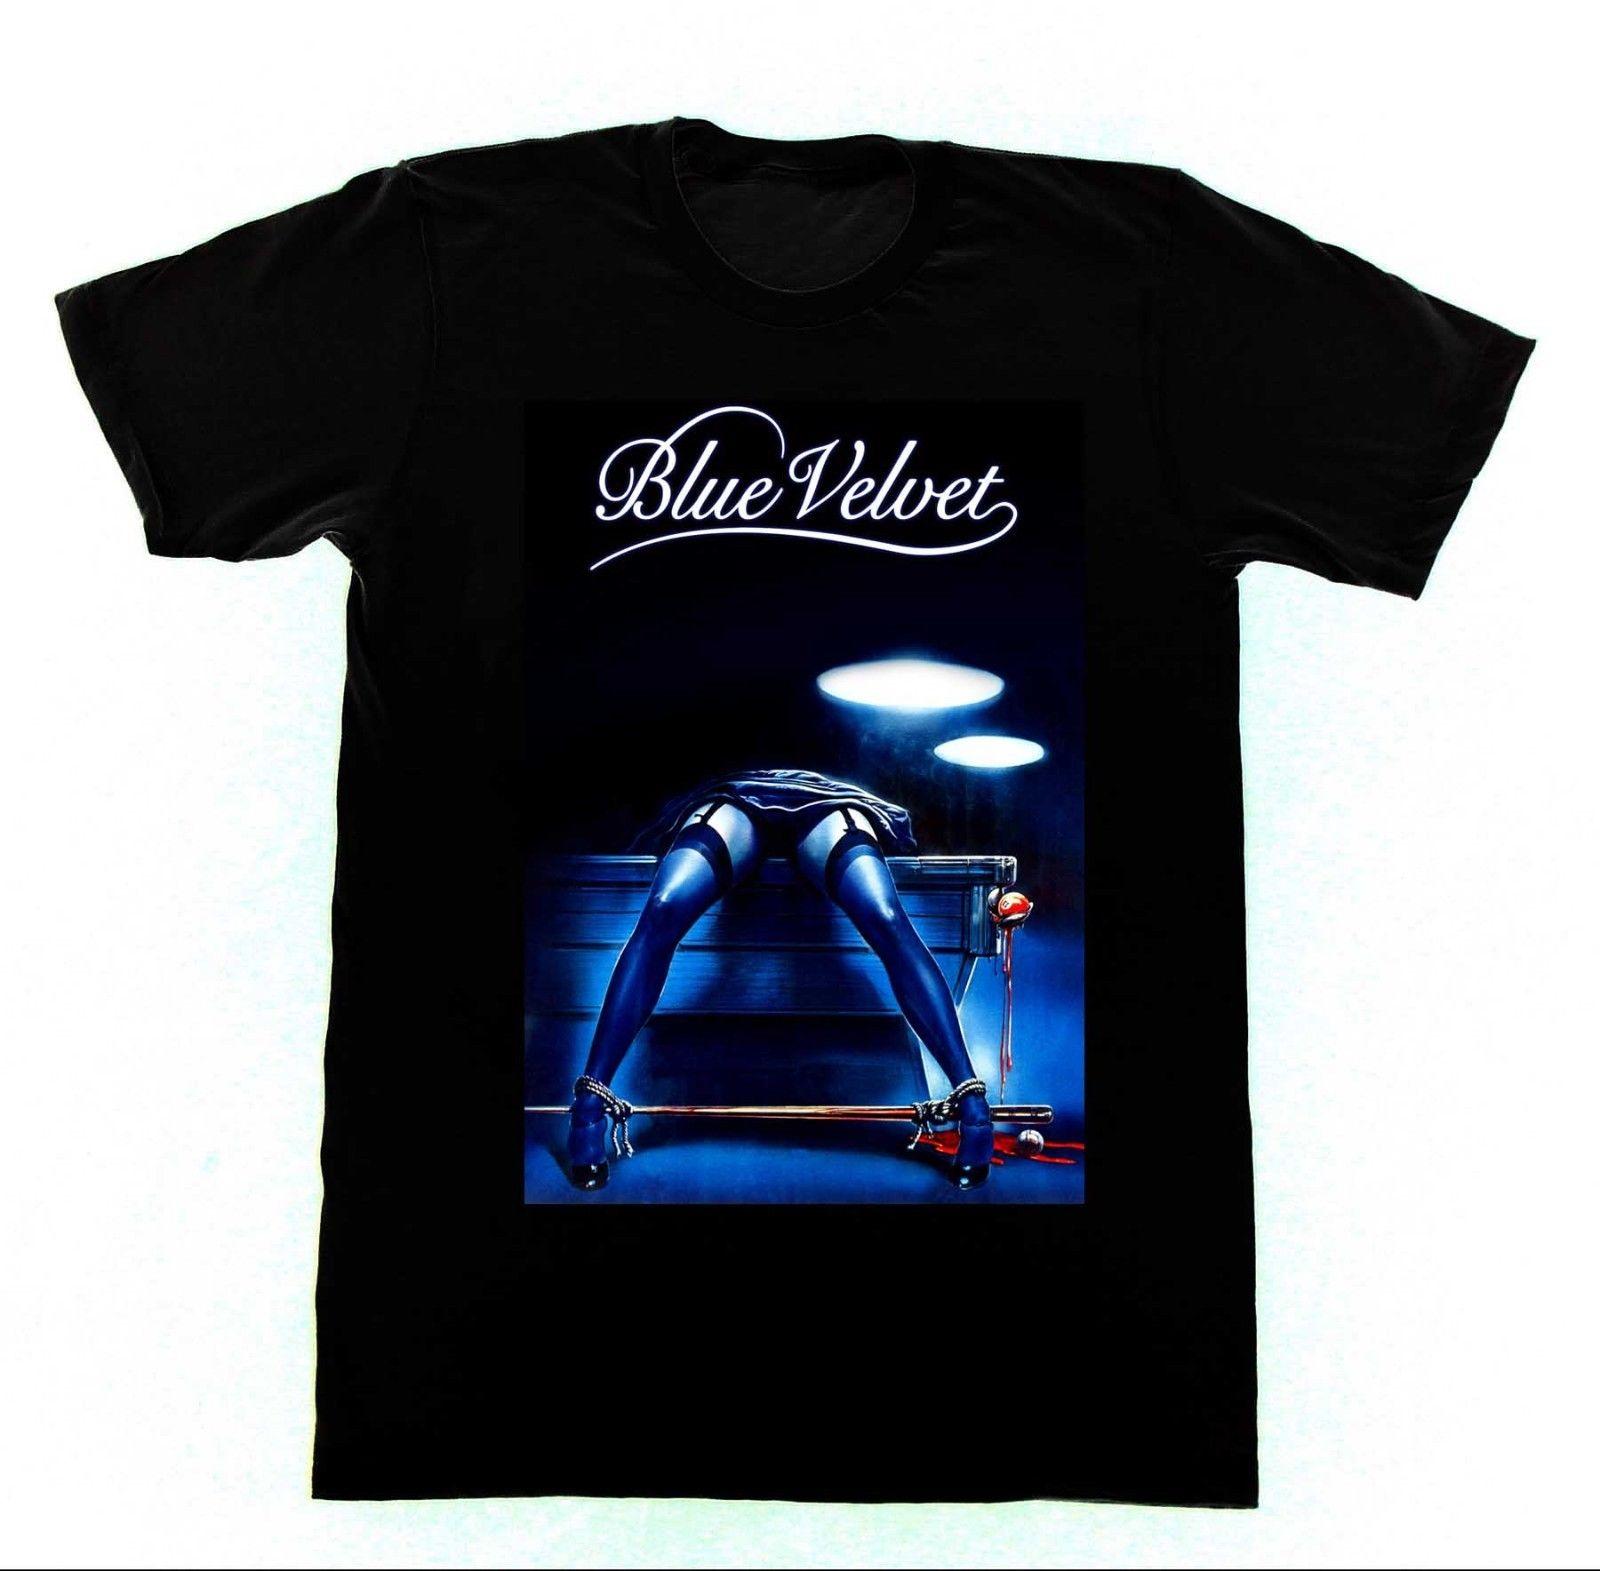 Blue Velvet David Lynch Tshirt 41 T-Shirt Cult Film BDSM Bondage Erotica Pre-Cotton Tee Shirt For Men